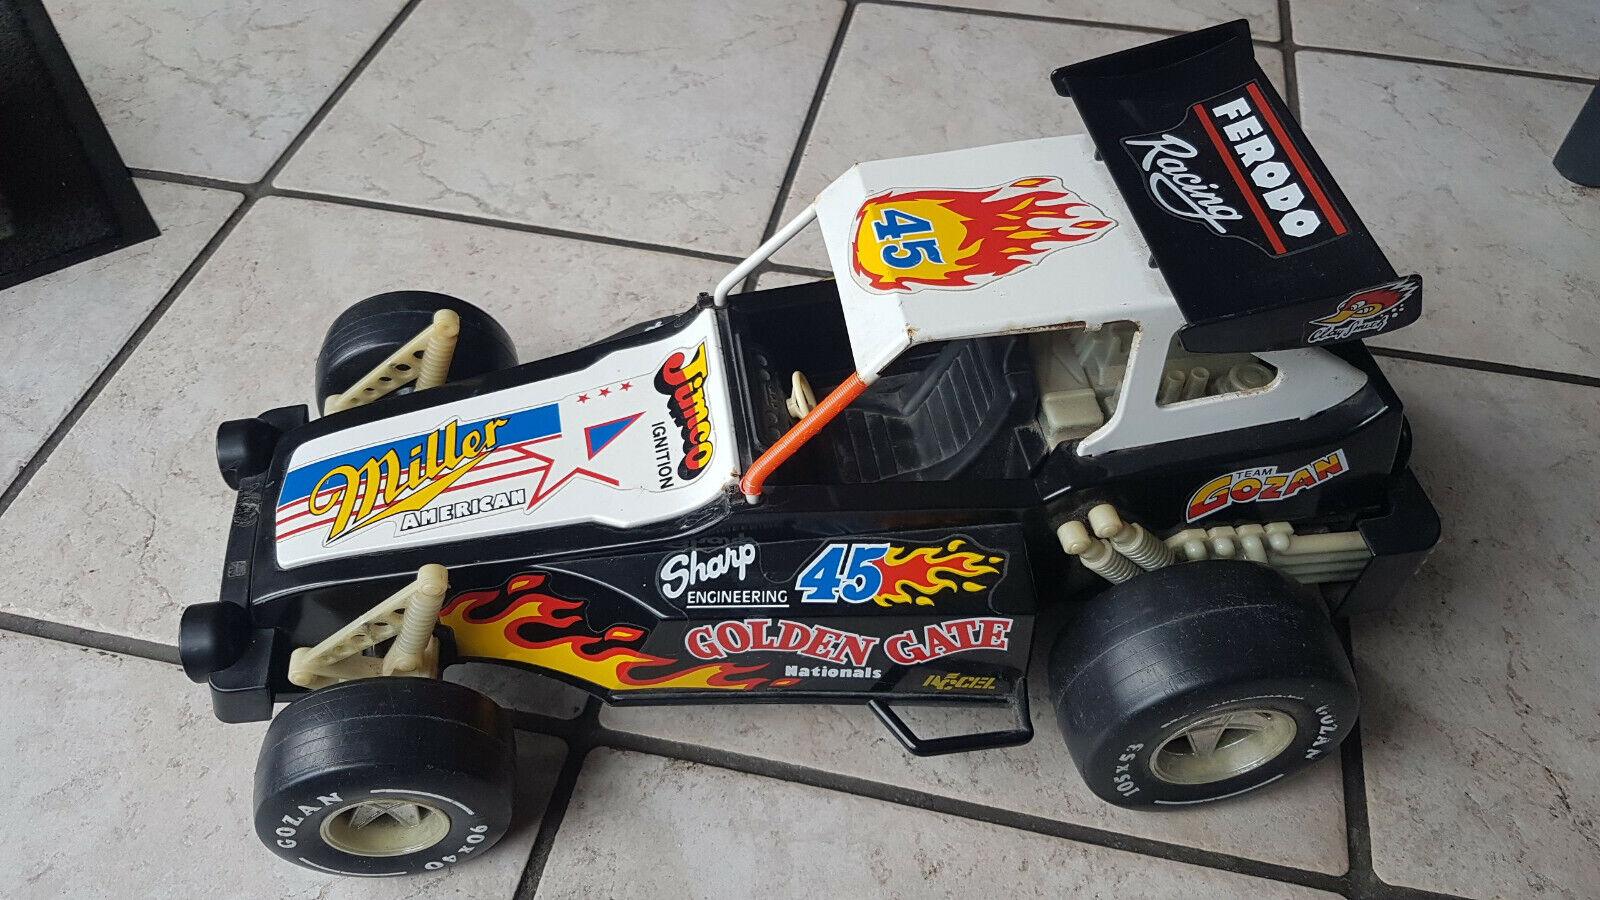 GOZAN - Rare ancienne voiture en tole team JIMCO IGNITION FERODO RACING